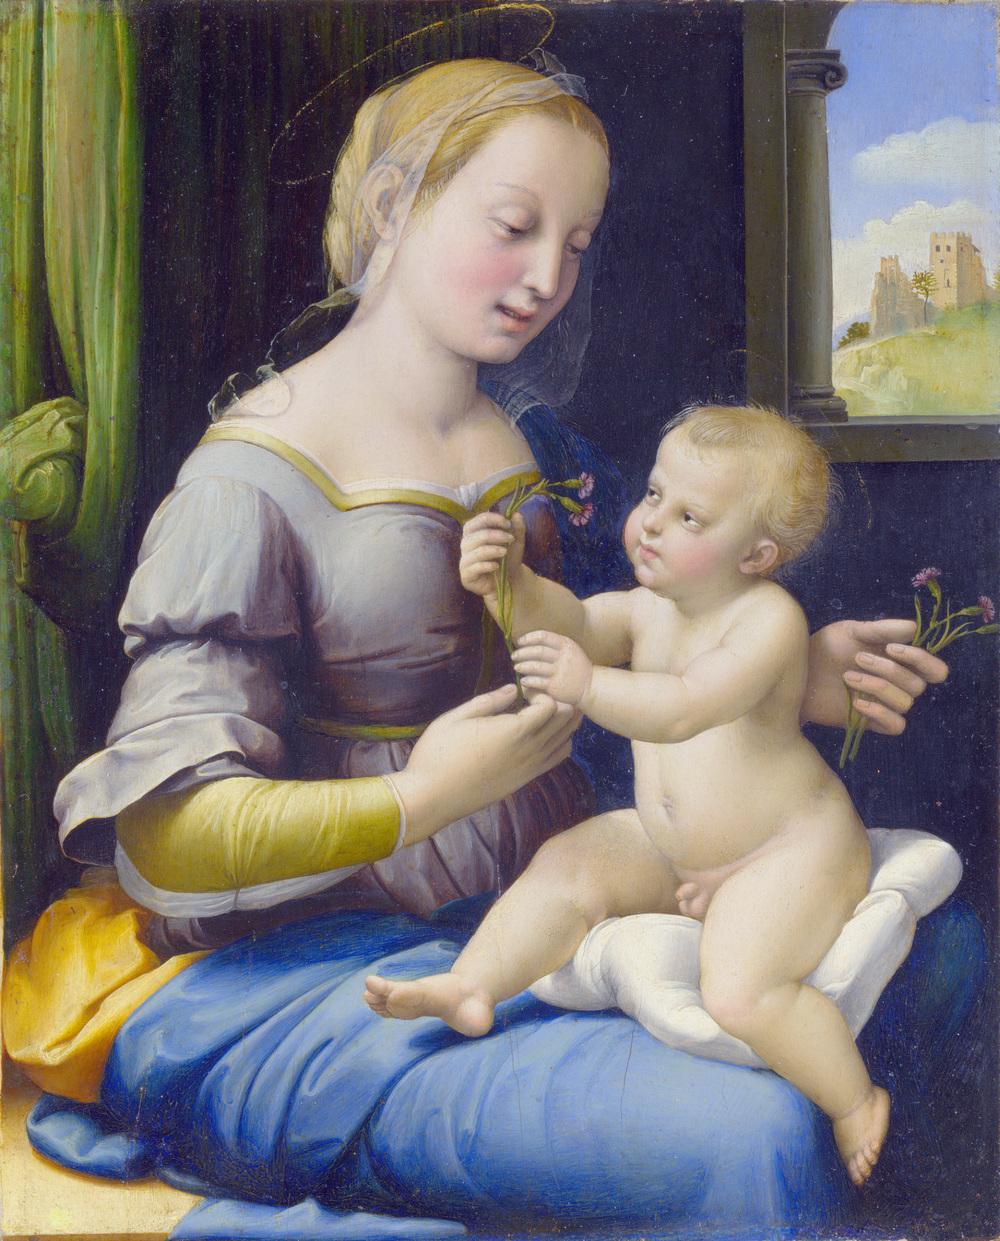 Raphael-Madonna_of_the_Pinks.jpg